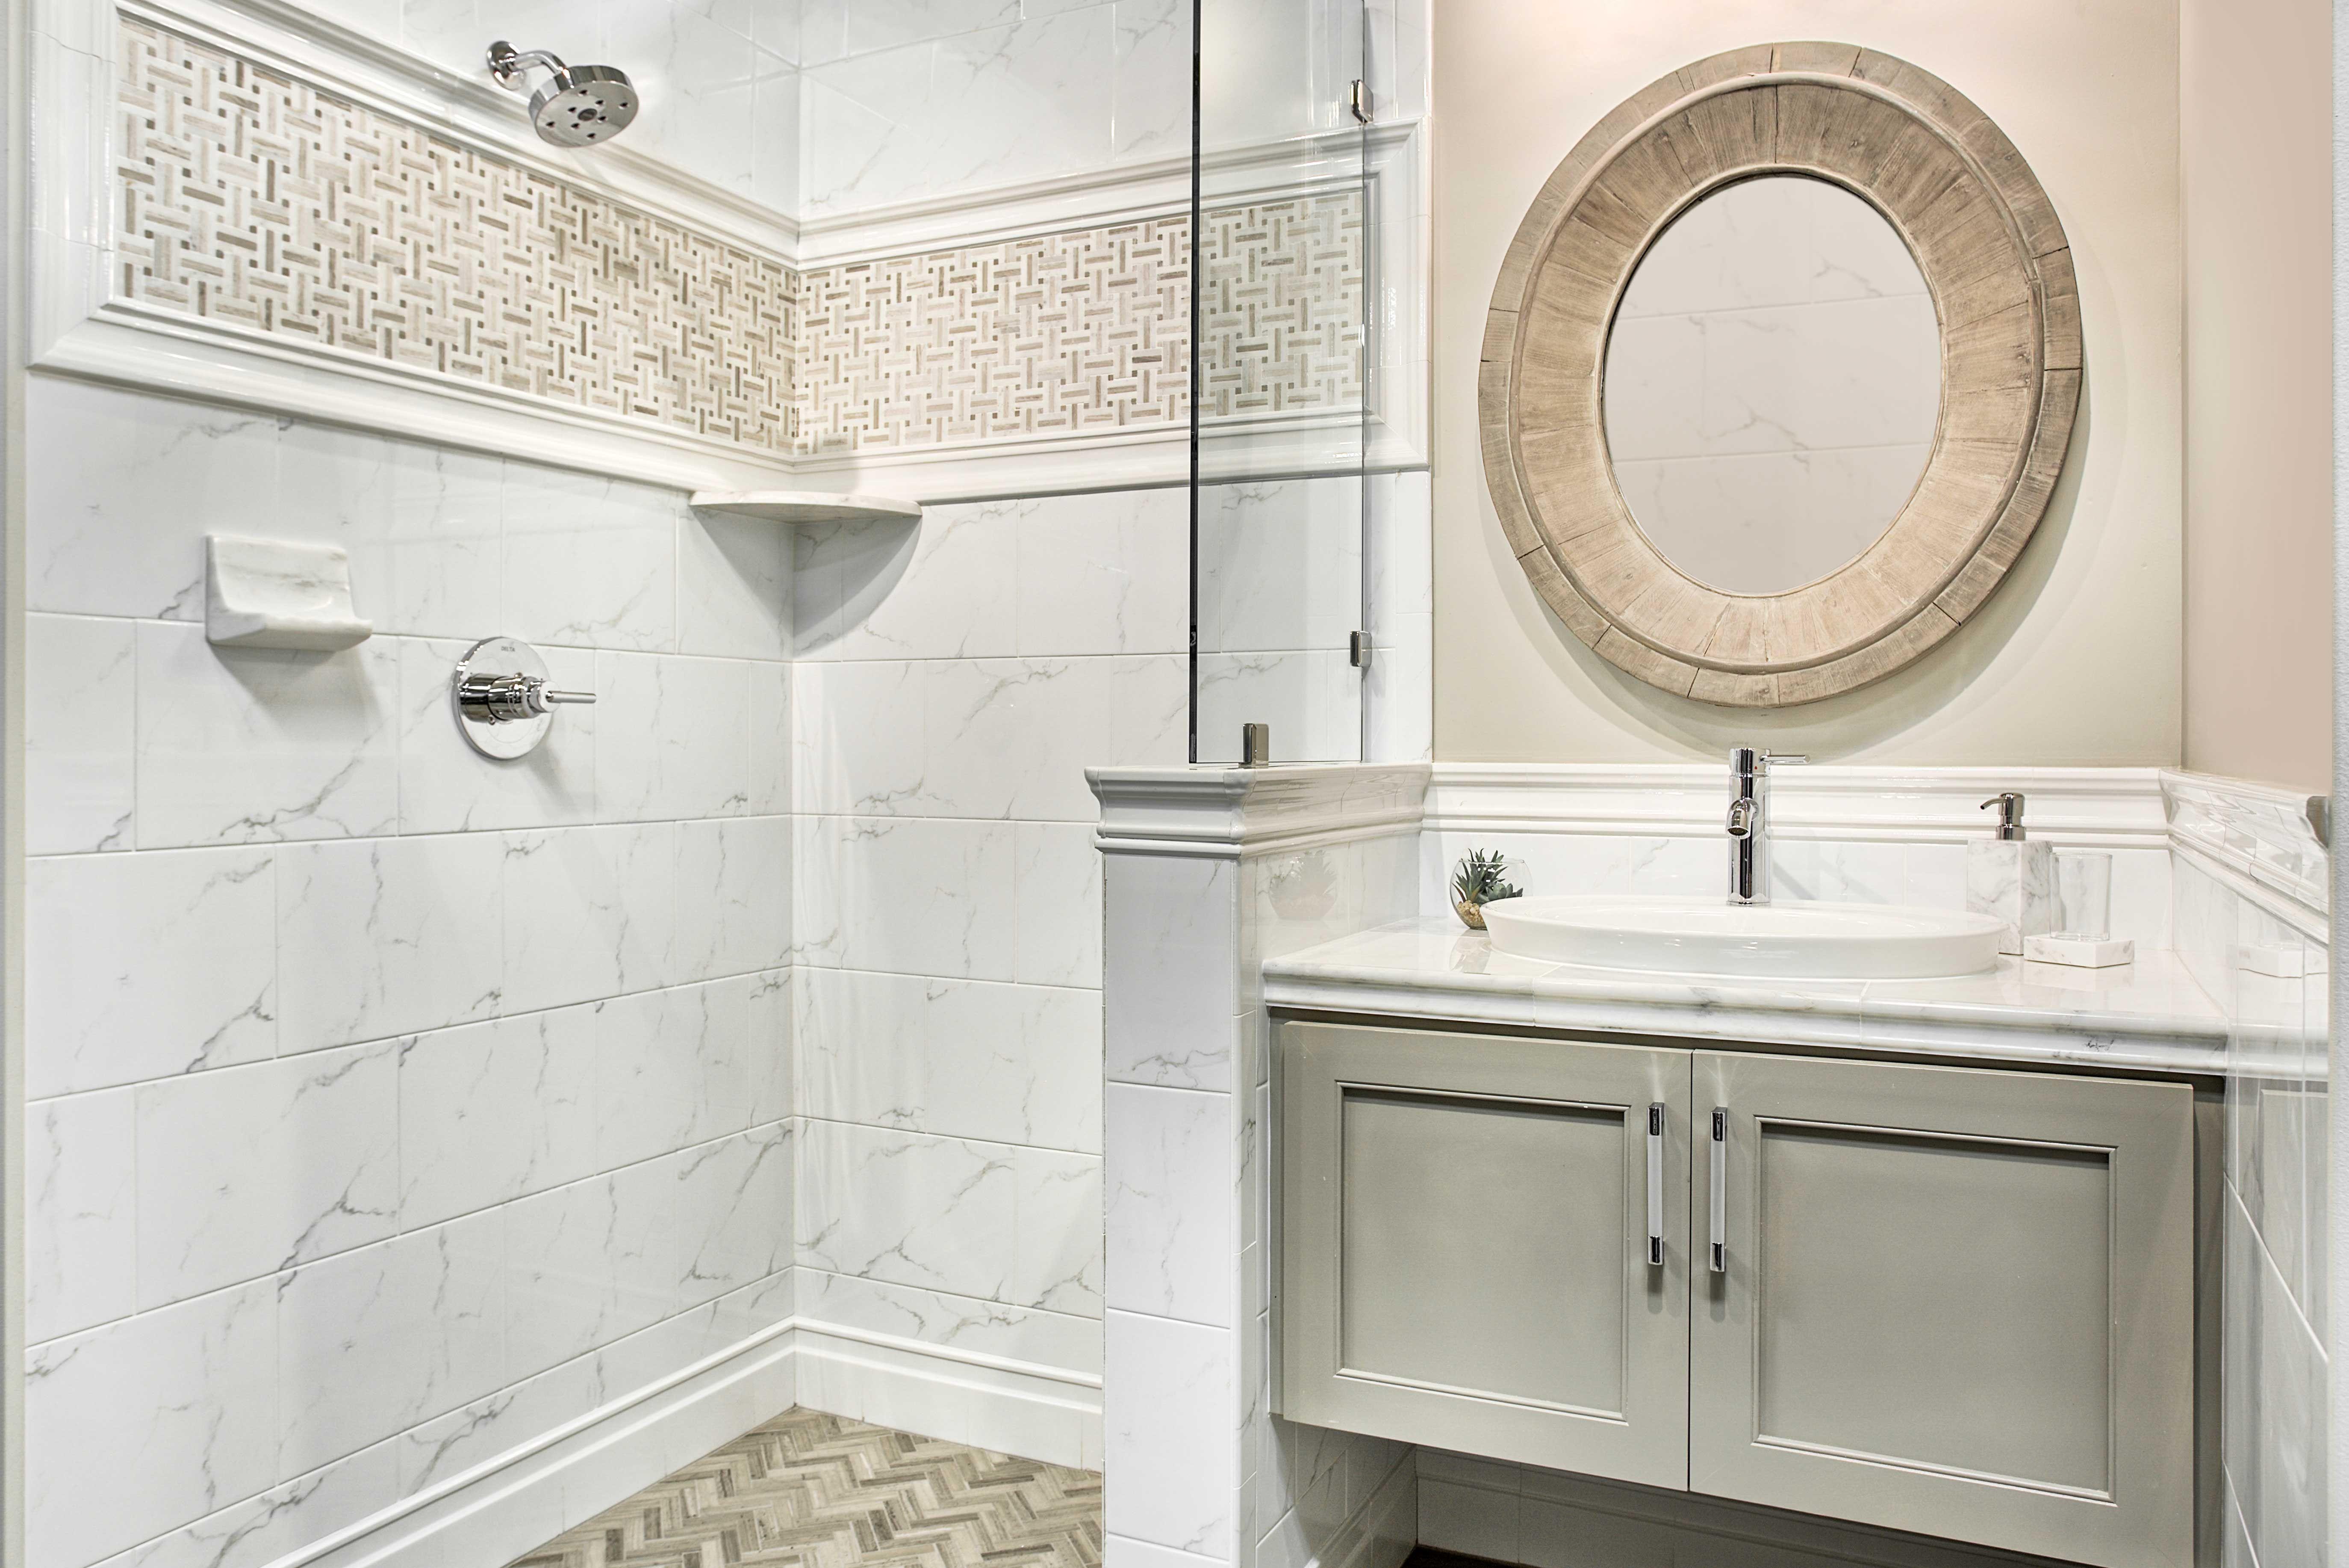 Bathroom Ceramic Wall Tile Calacutta Bianco Gloss 10 X 13 In